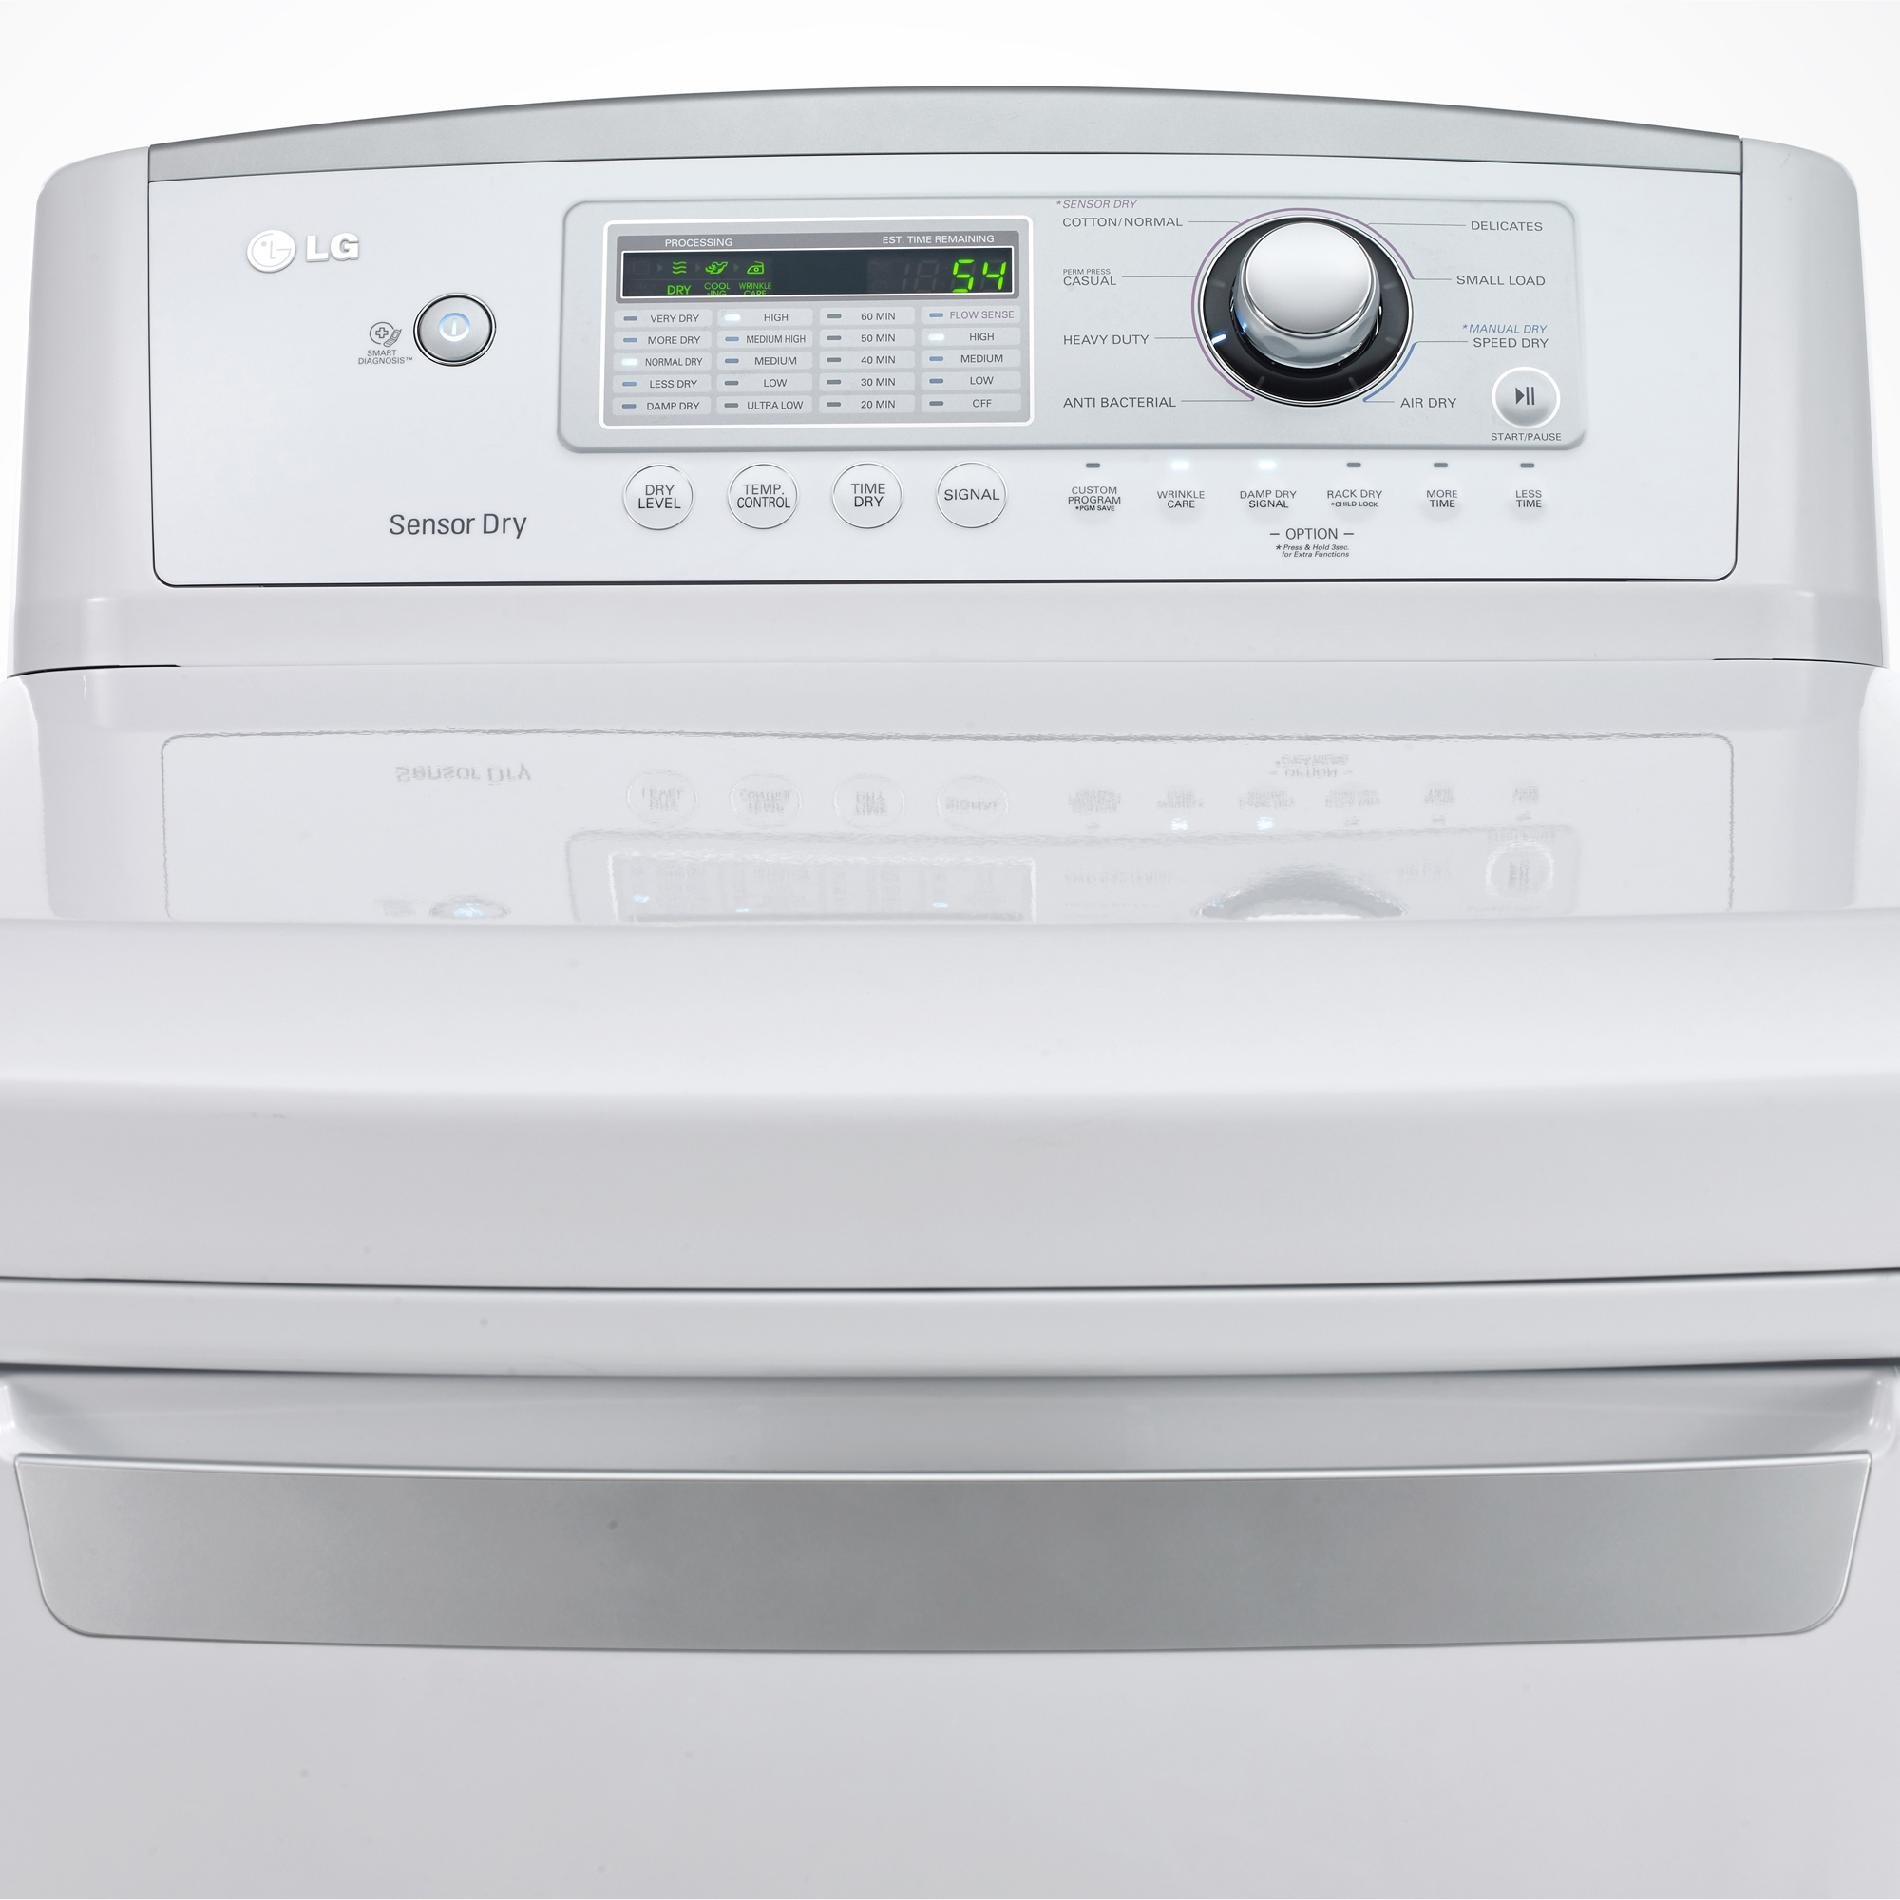 LG DLE4970W 7.3 cu. ft. Electric Dryer w/Sensor Dry Technology